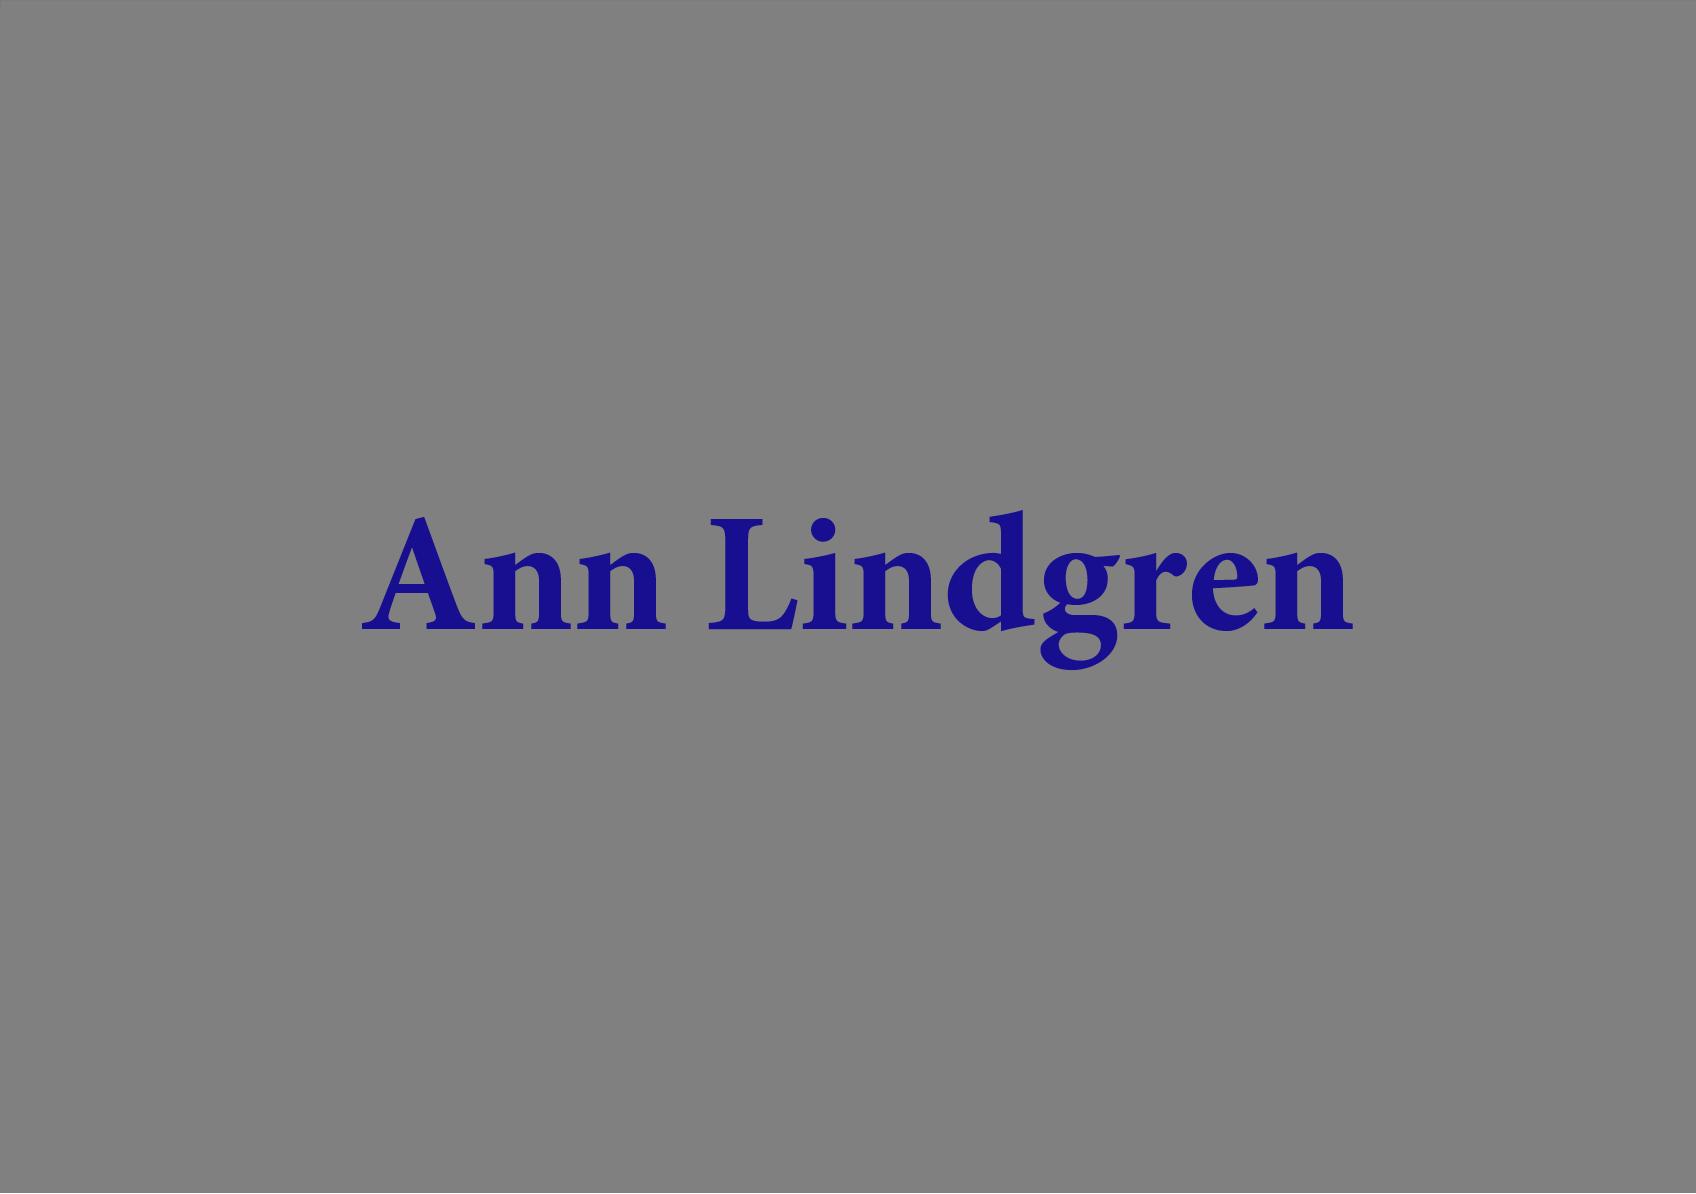 Ann Lindgren.png